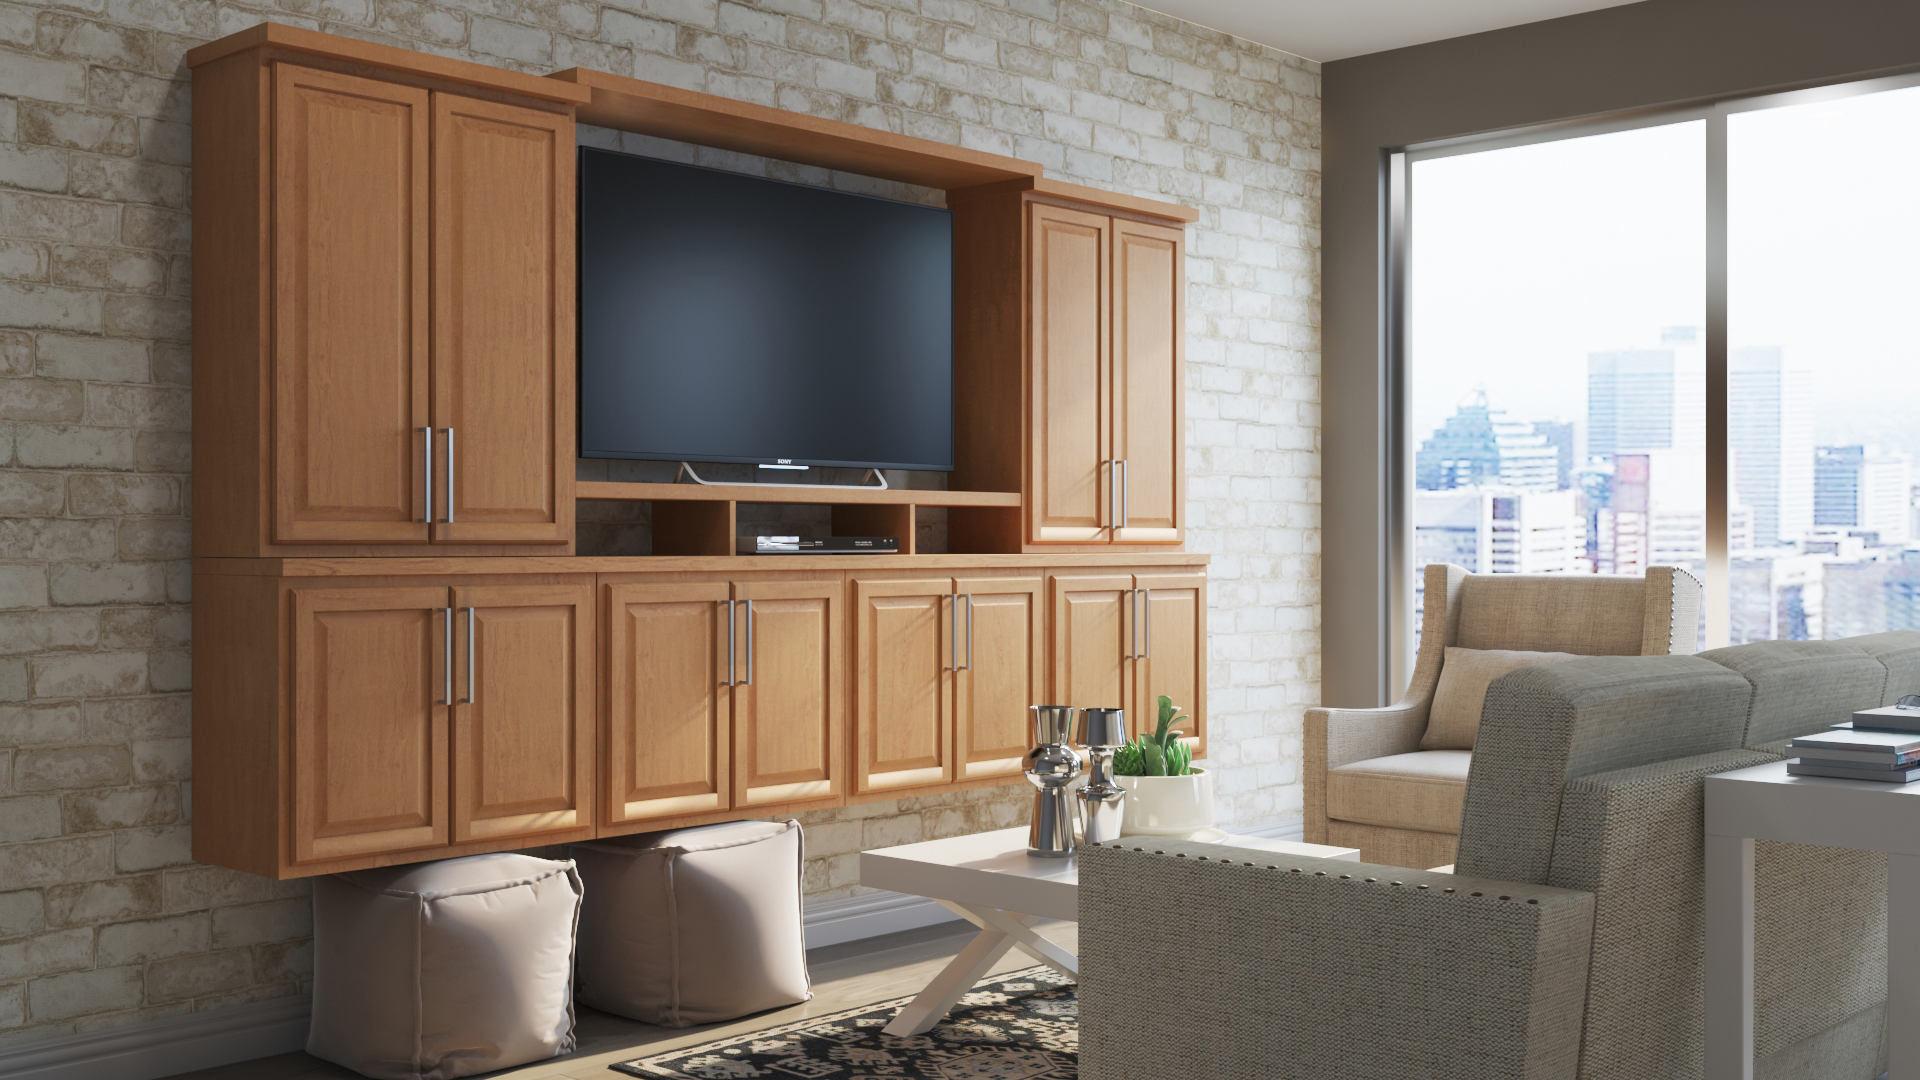 Hampton Wall Kitchen Cabinets In Medium Oak Kitchen